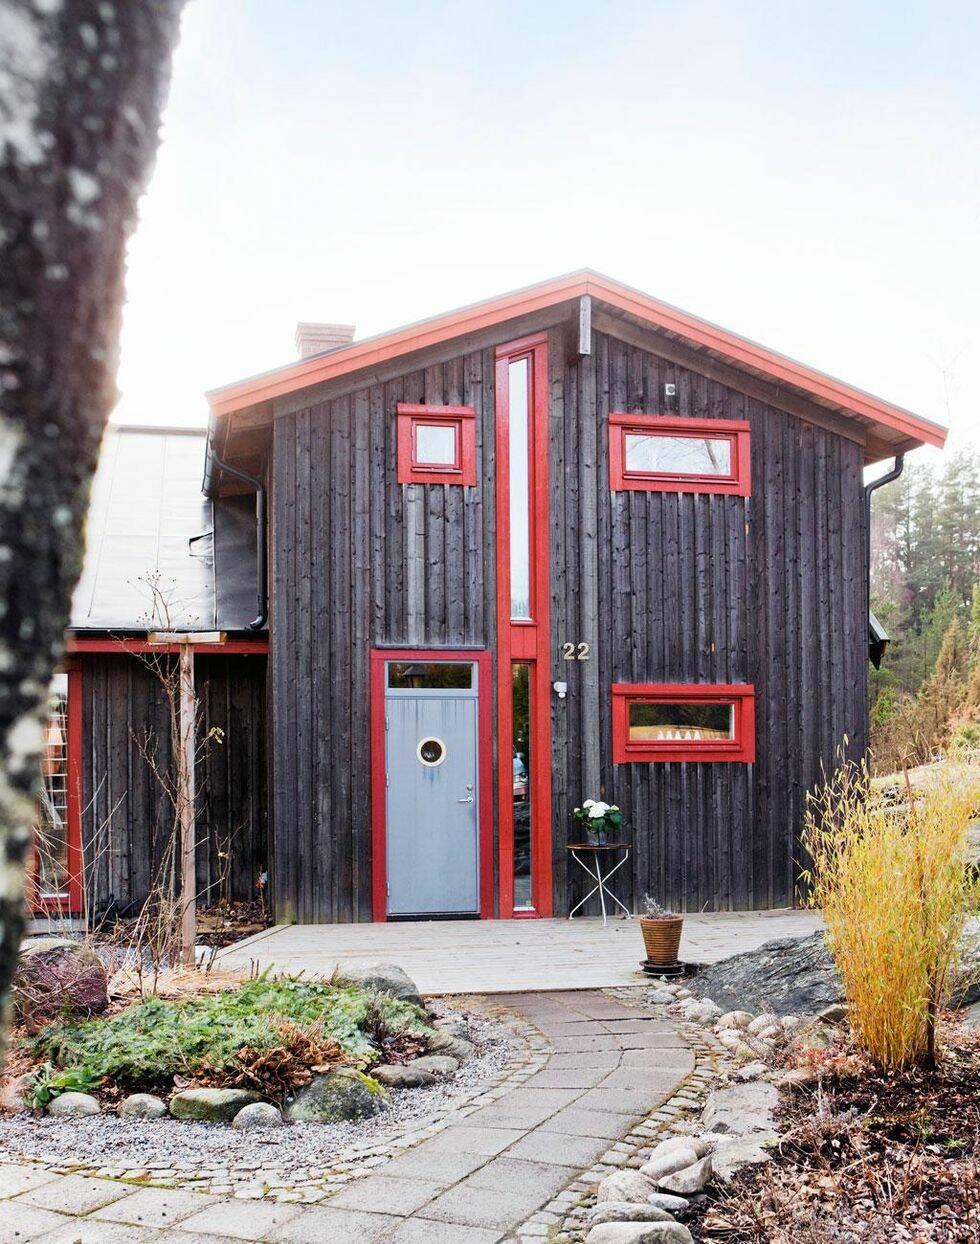 Naturen har format huset